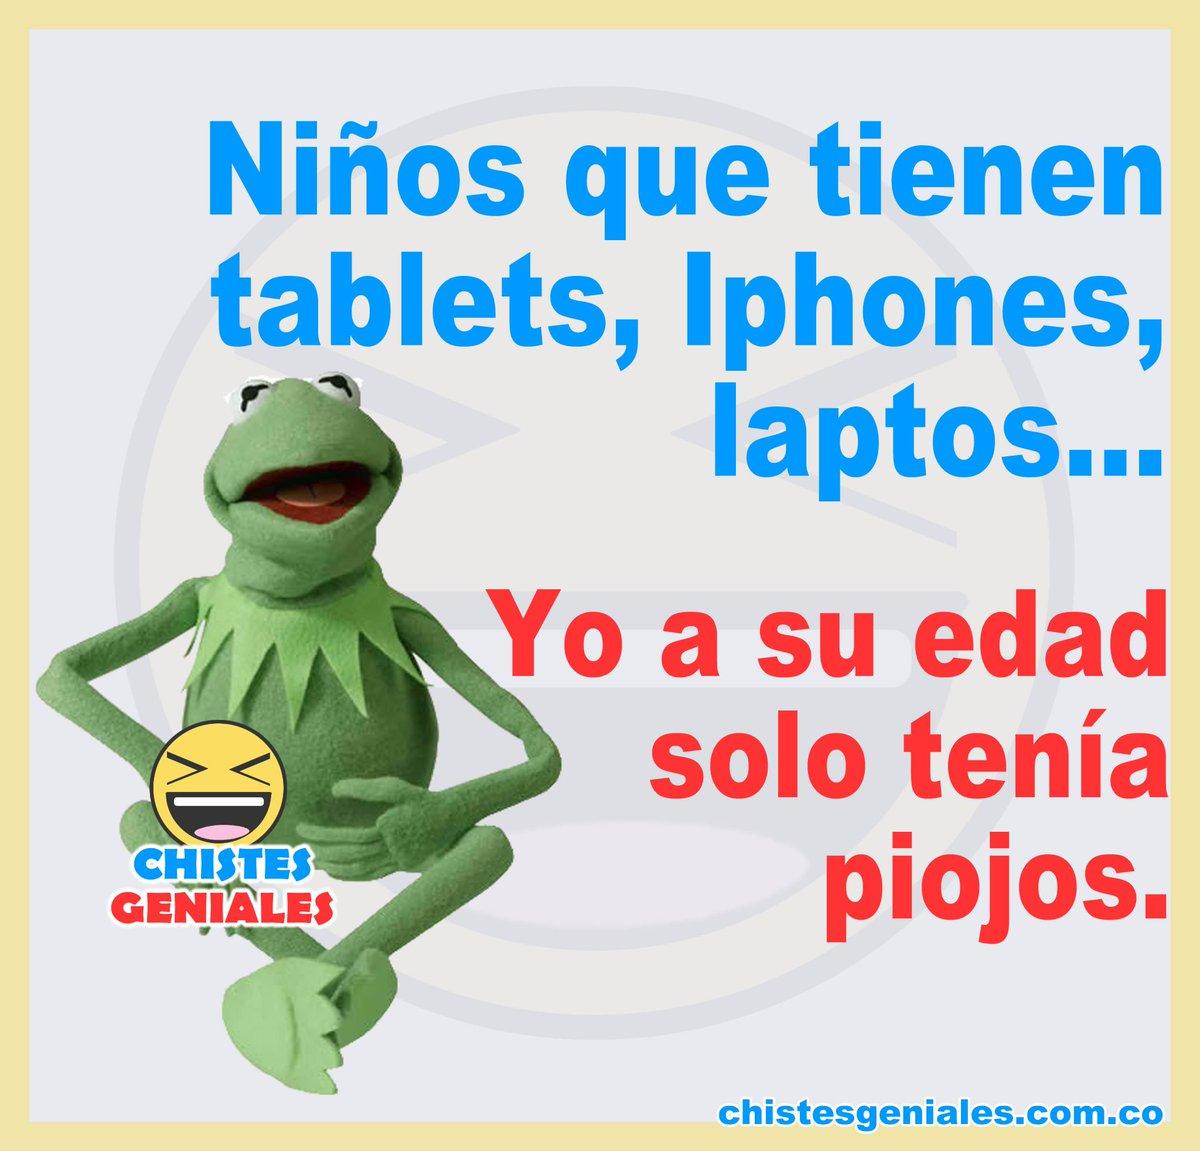 Chistesgeniales Chistes Humor Síguenos En At Chistegeniales Tweet